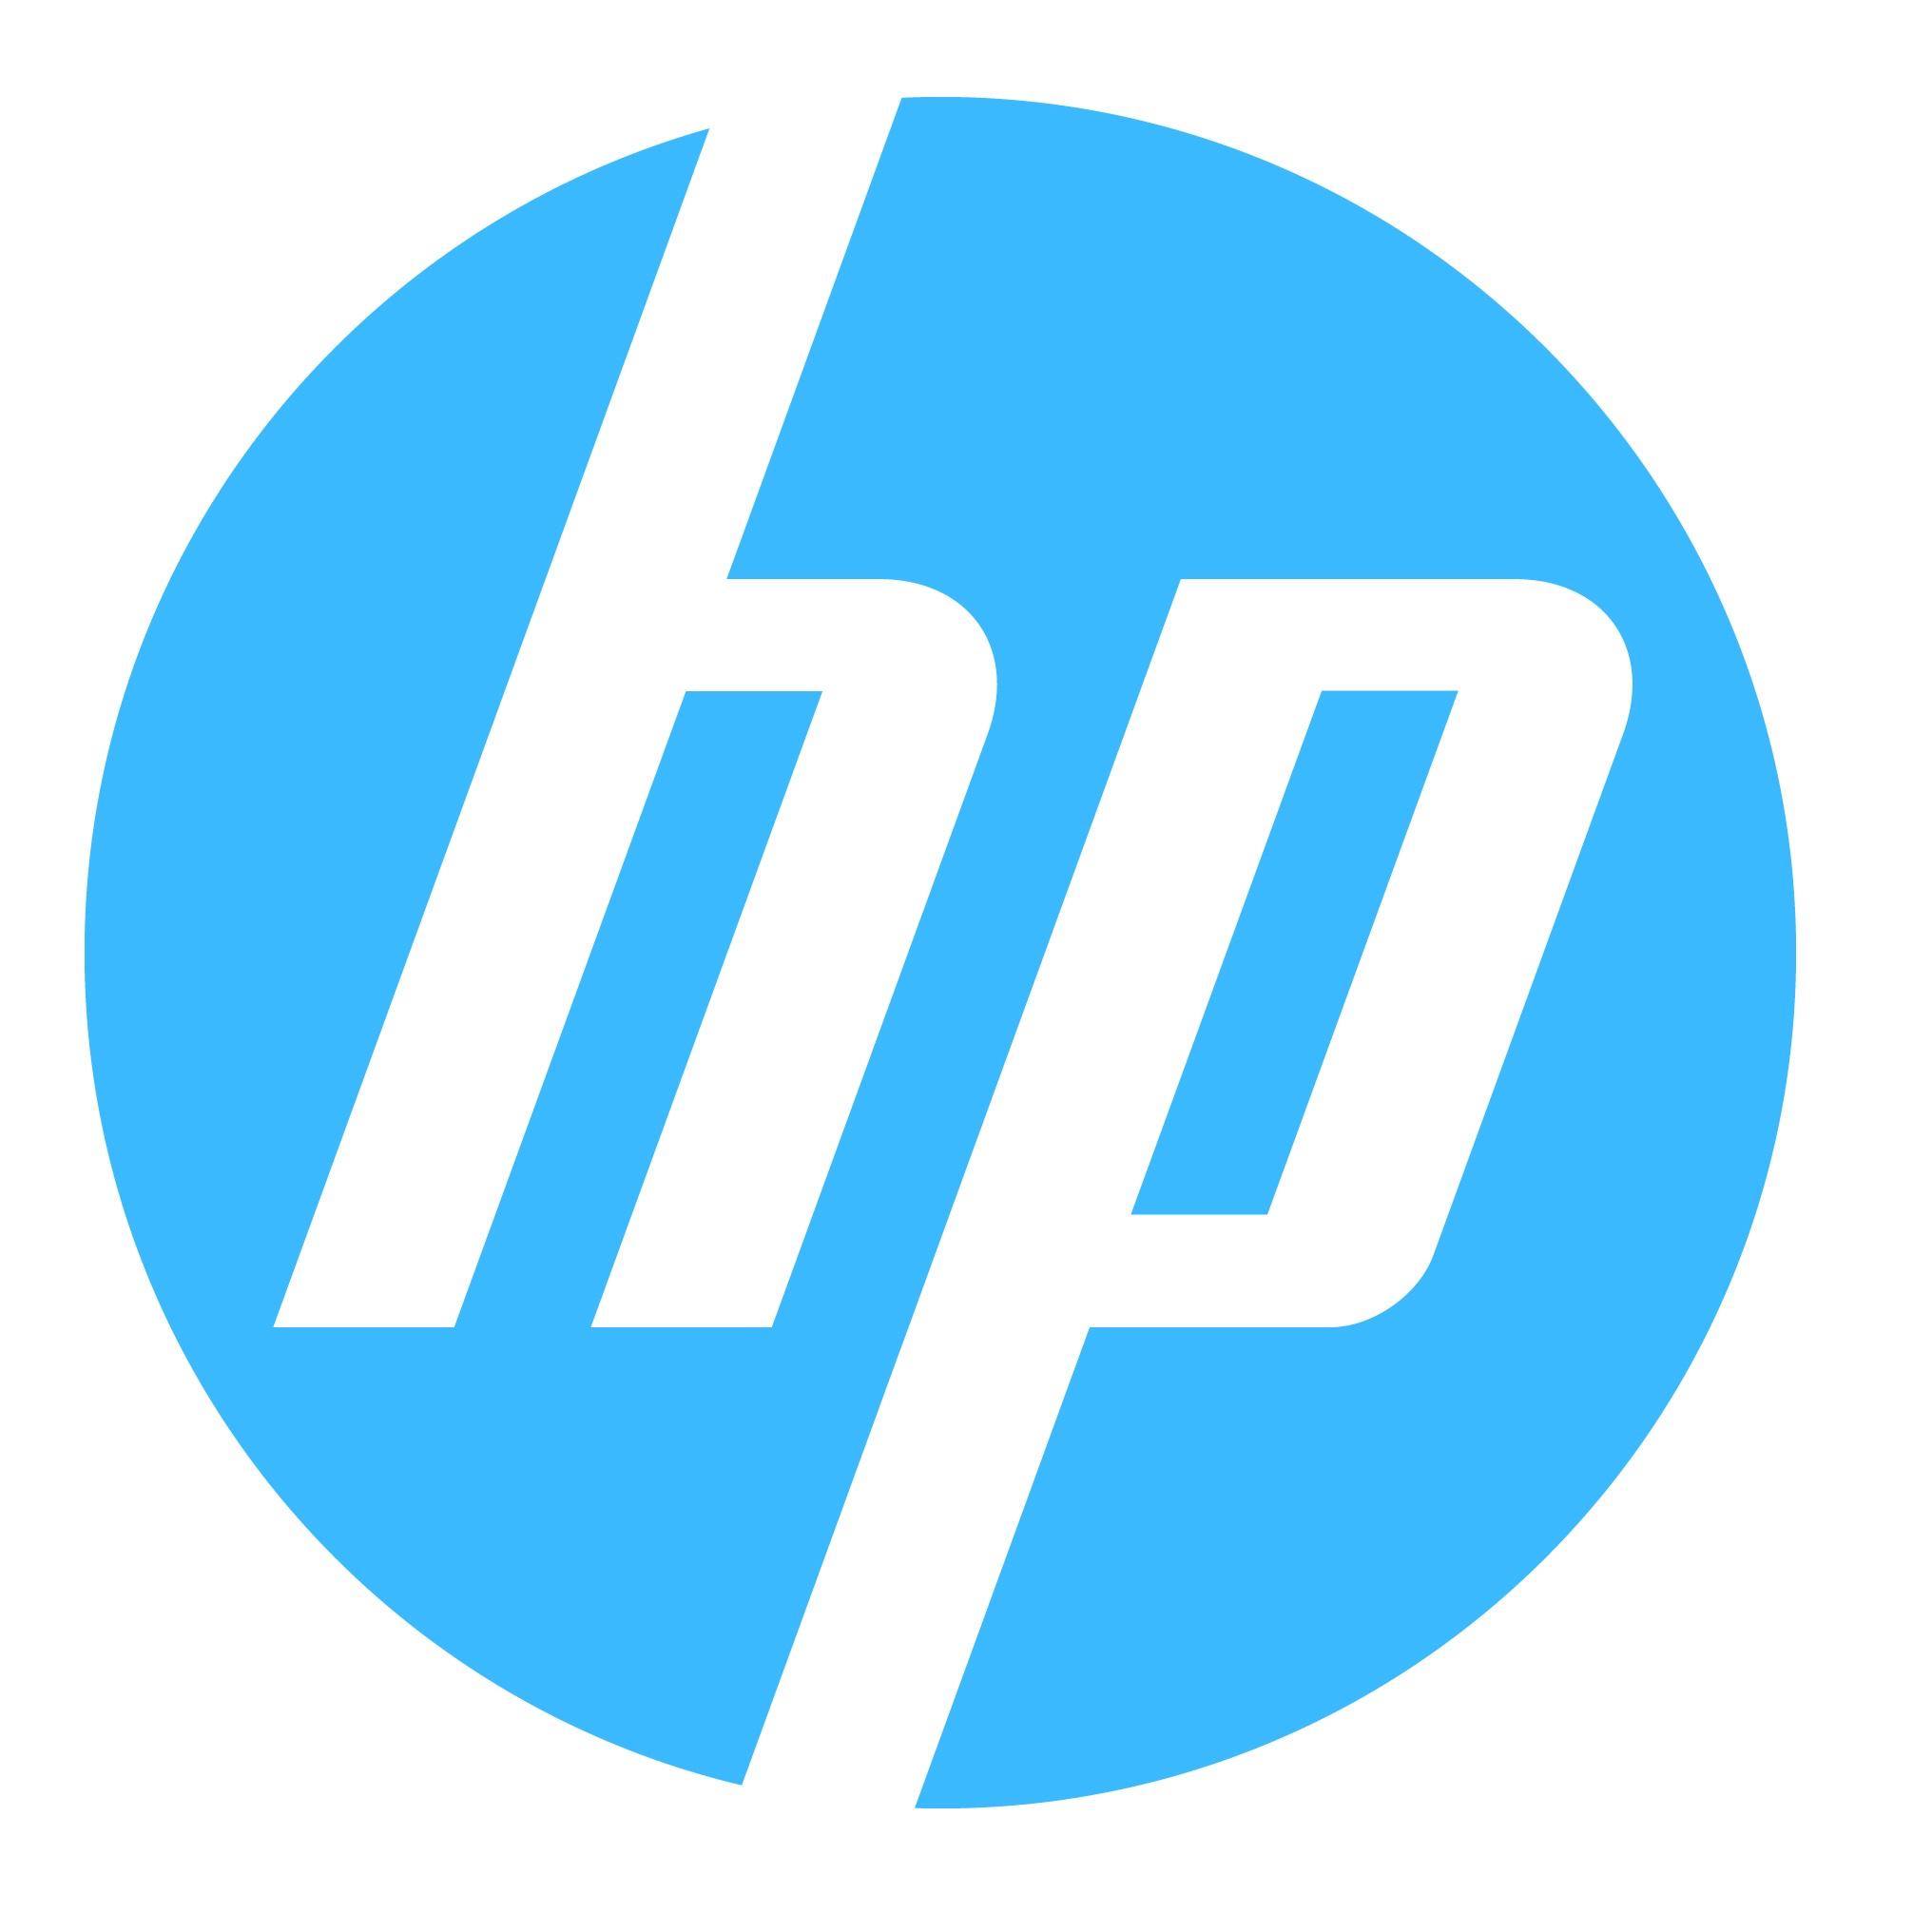 HP U4812E 3Yr Pickup Rtn Pavilion/Presario Desktop Warranty Pack